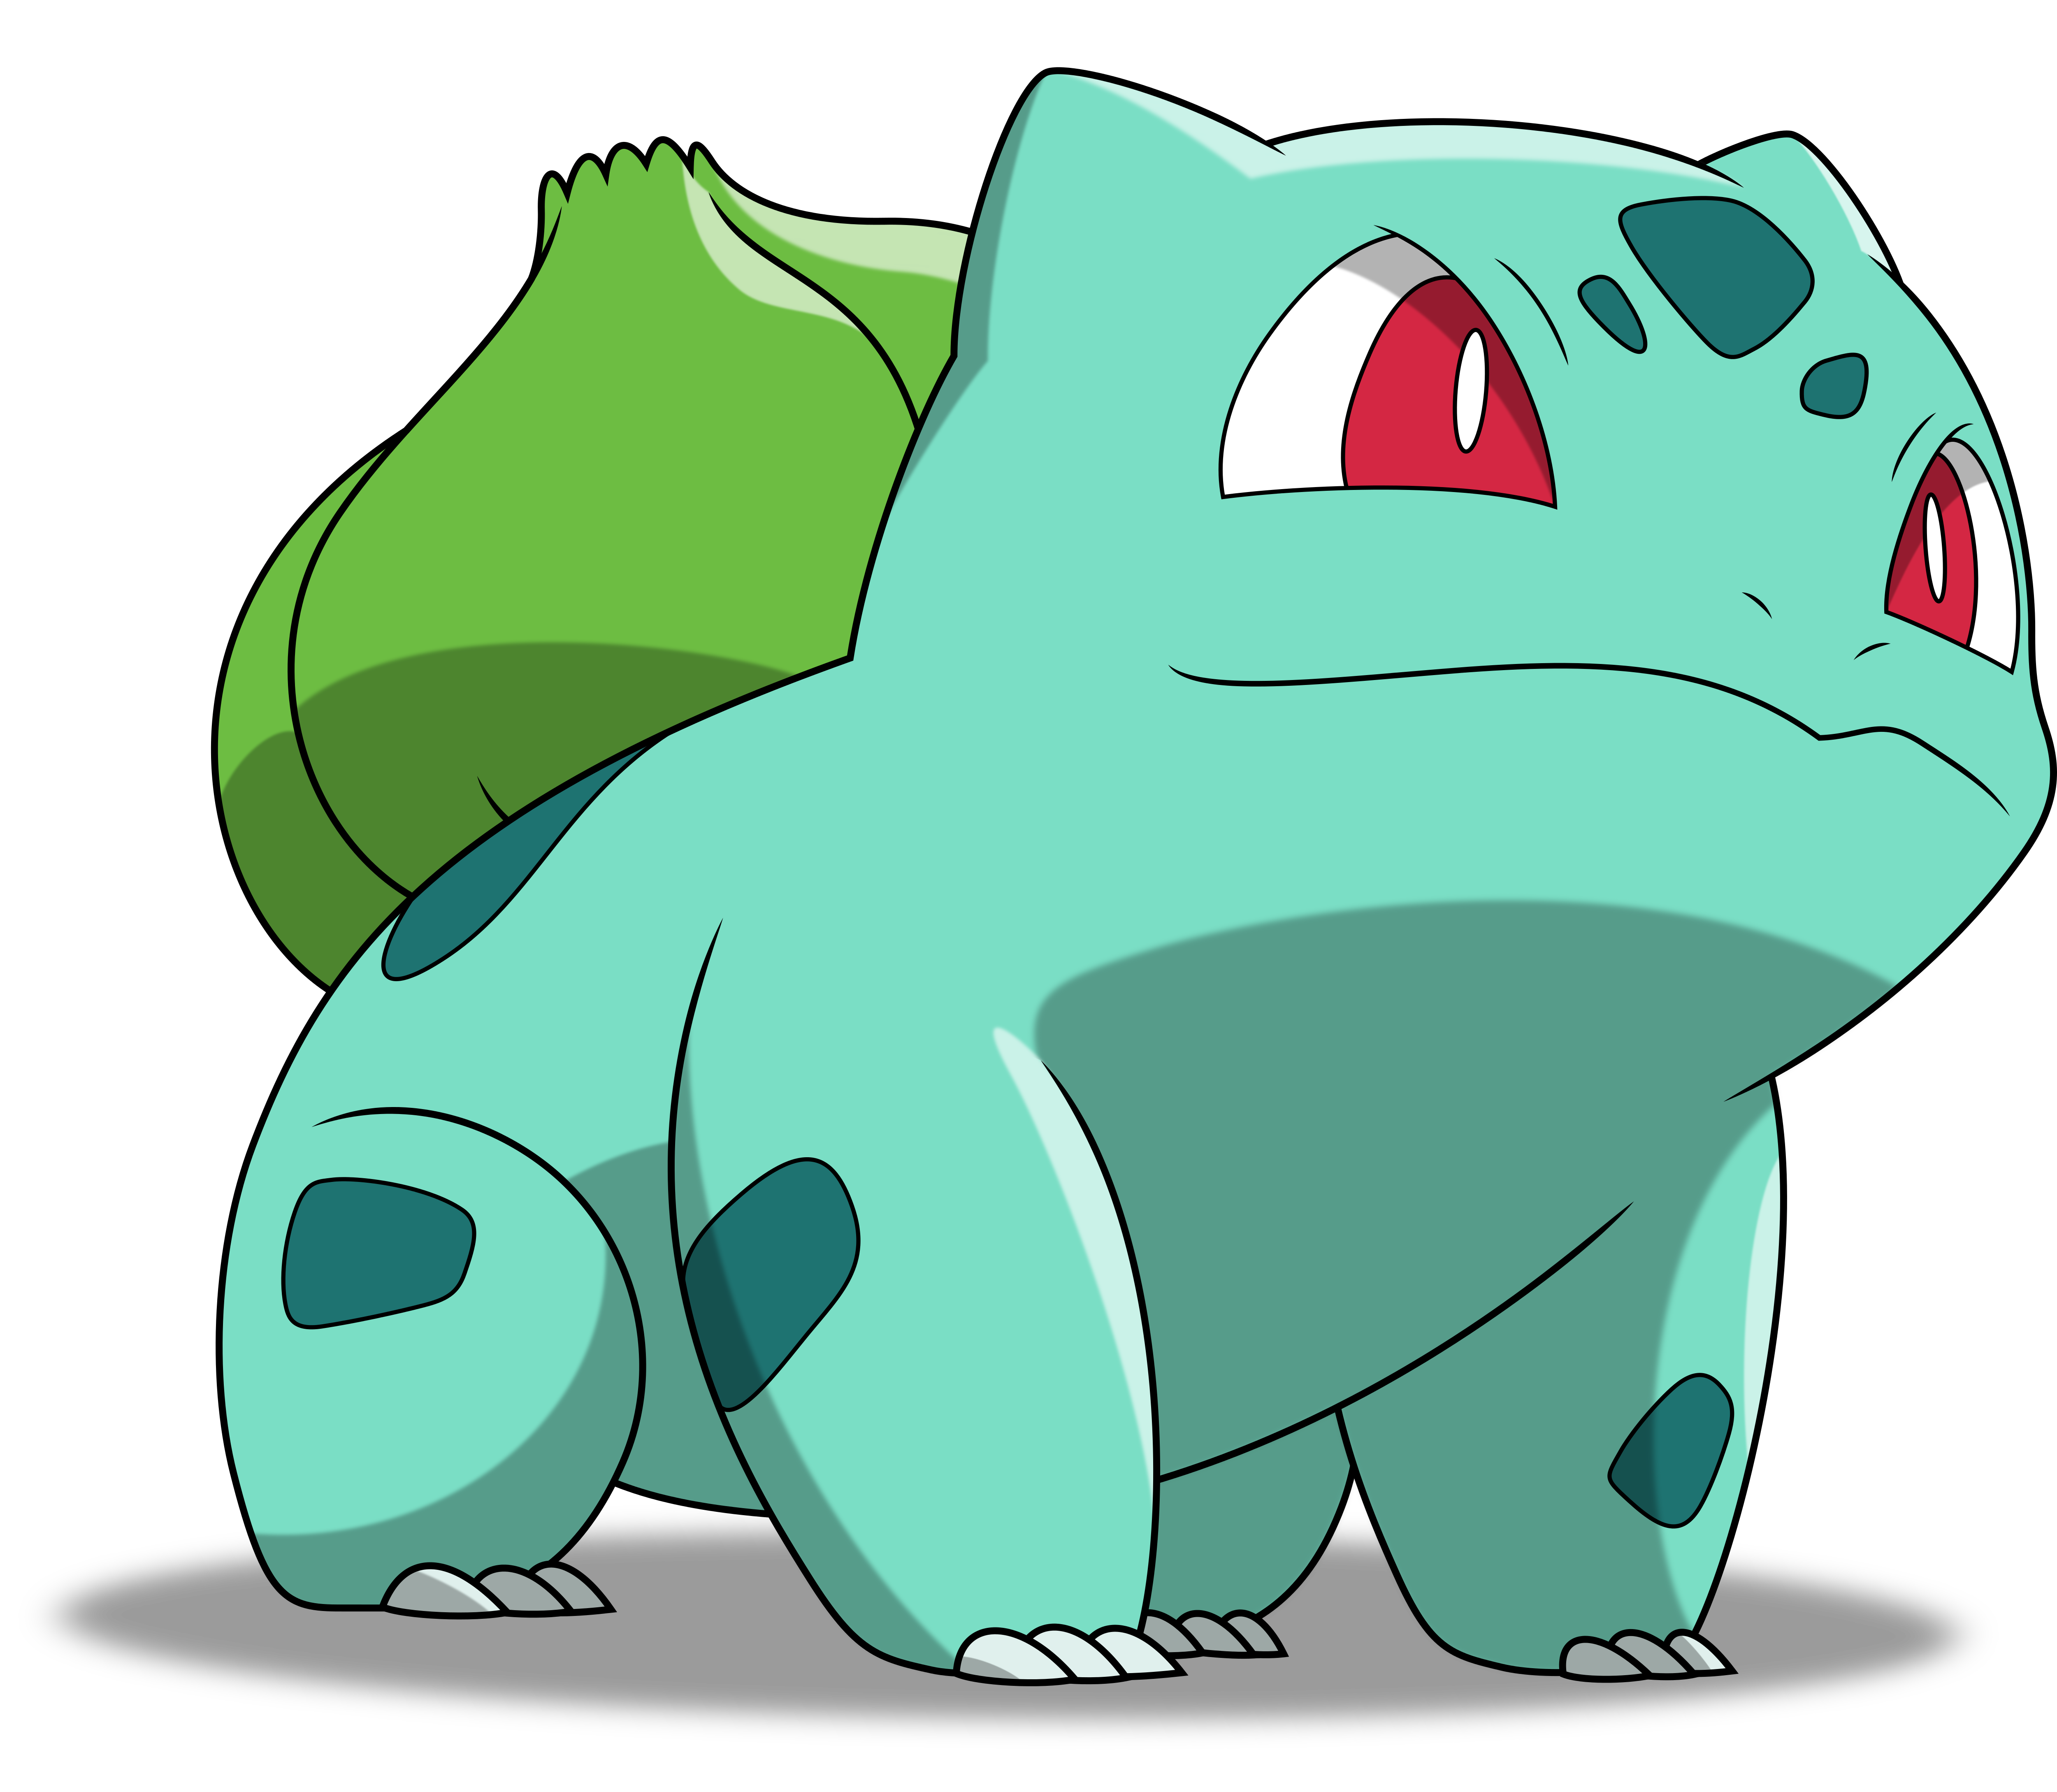 Bulbasaur Images